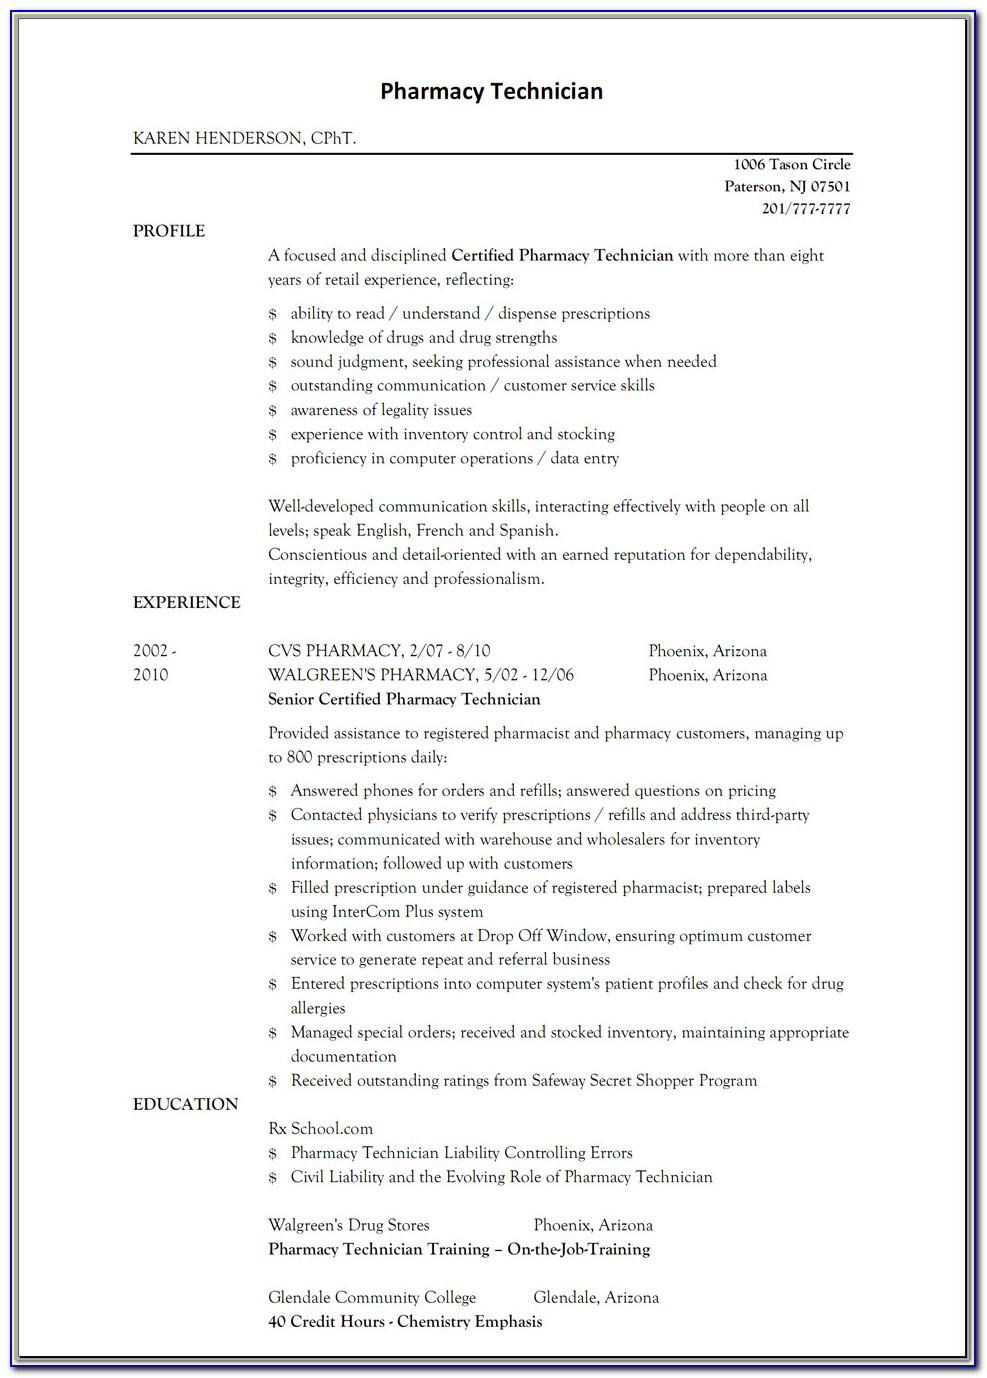 Sample Hospital Pharmacy Technician Resume